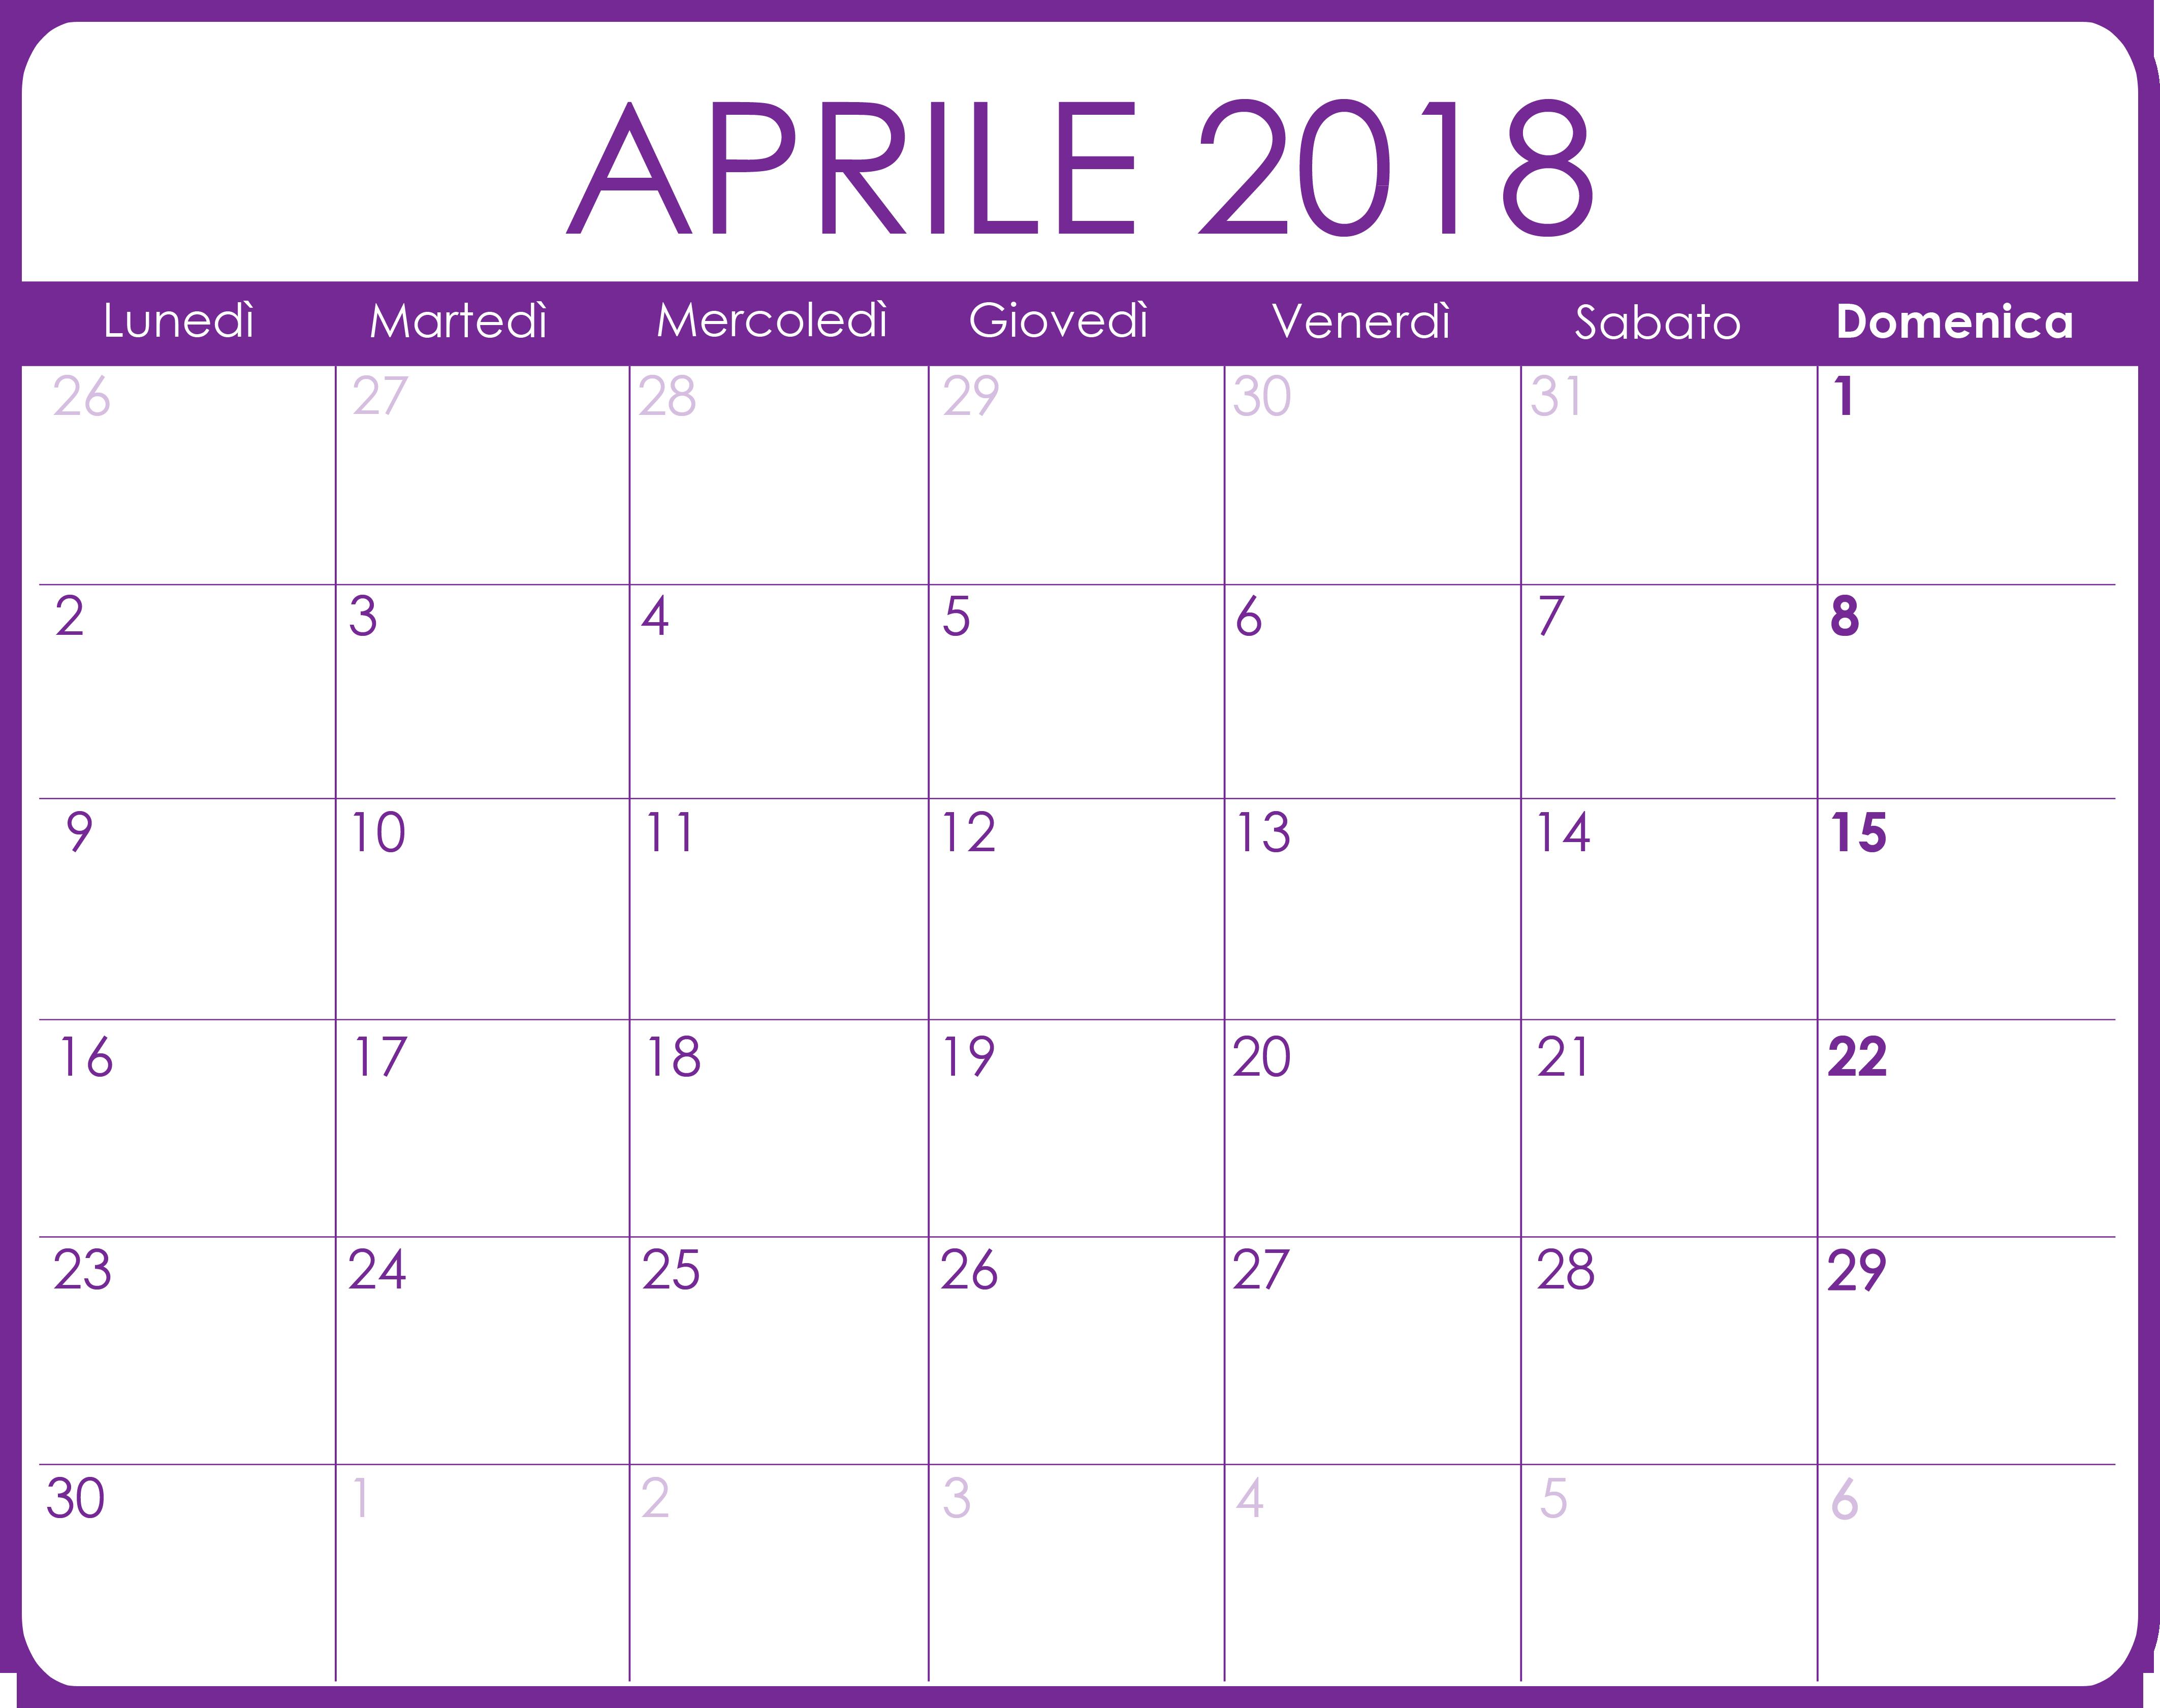 Calendario Aprile 2020 Con Santi.Calendario Aprile 2018 Calendario Dicembre Calendario E